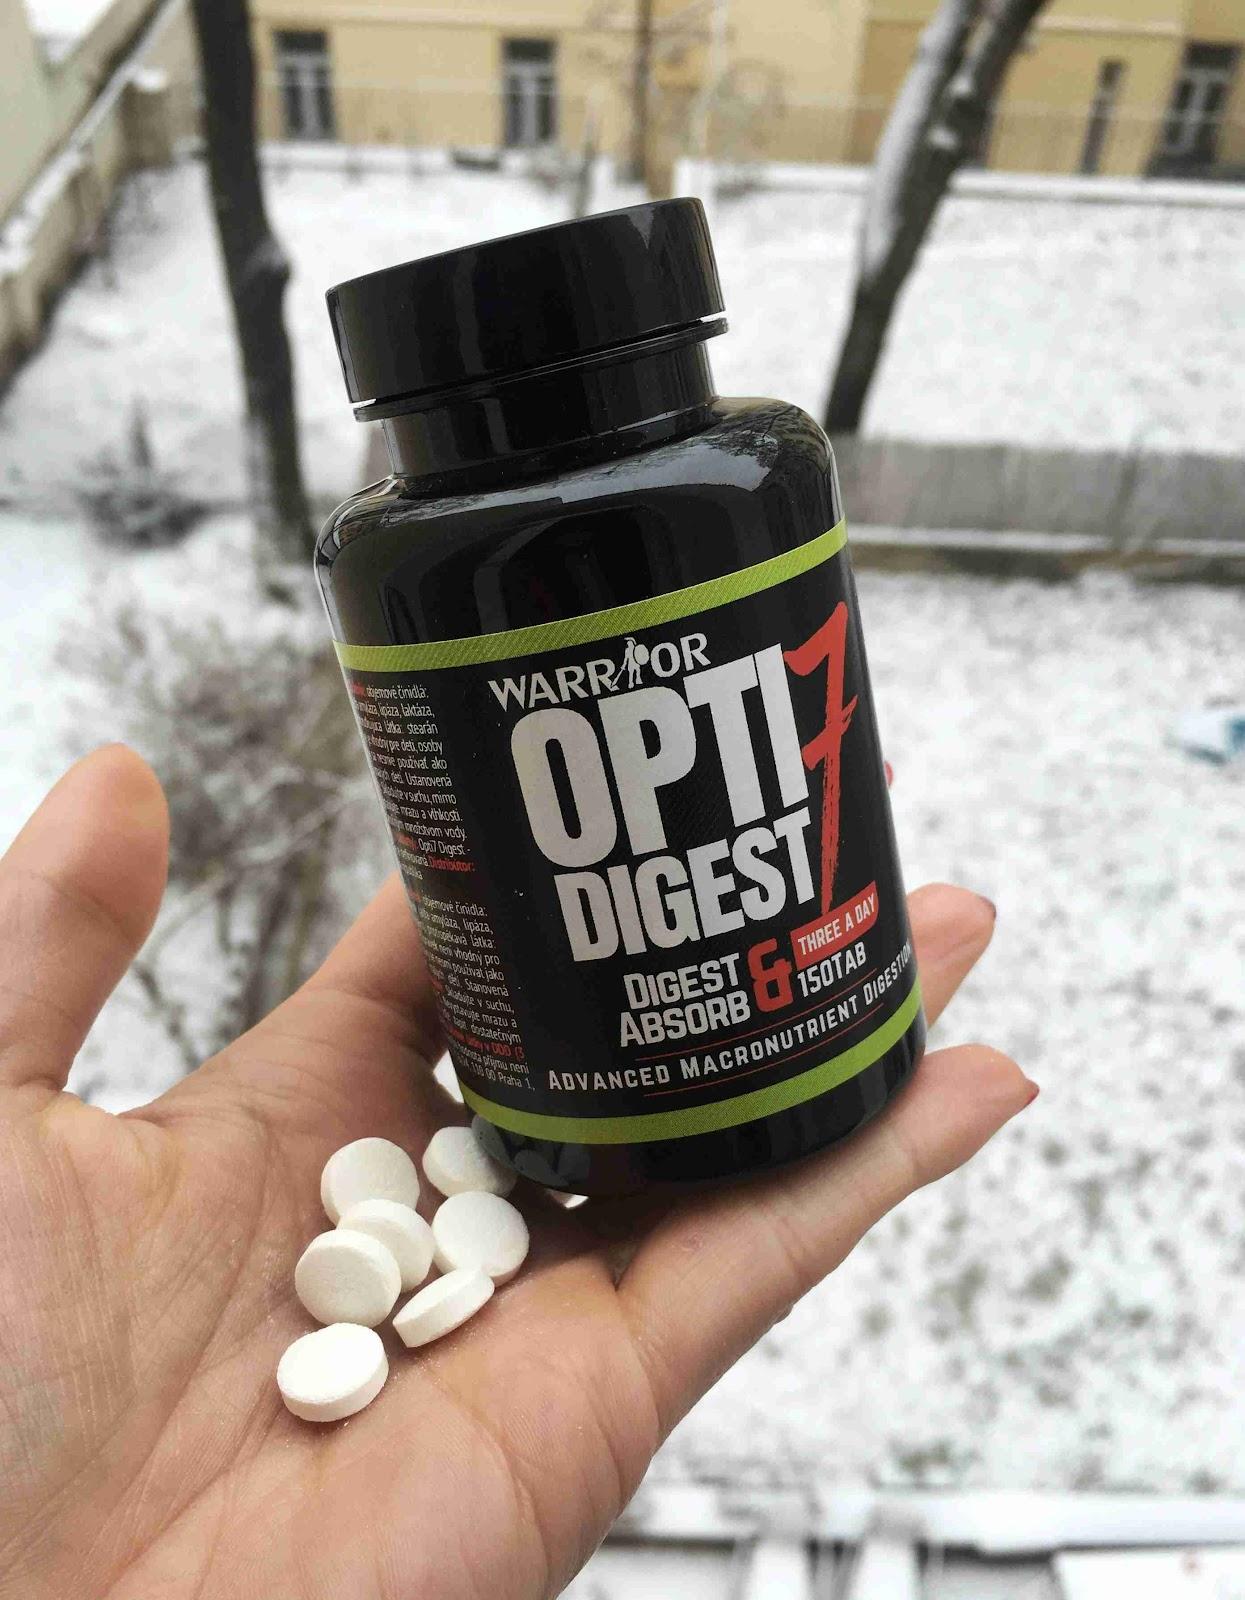 Recenze NaMaximum: Trávicí enzymy Opti 7 Digest